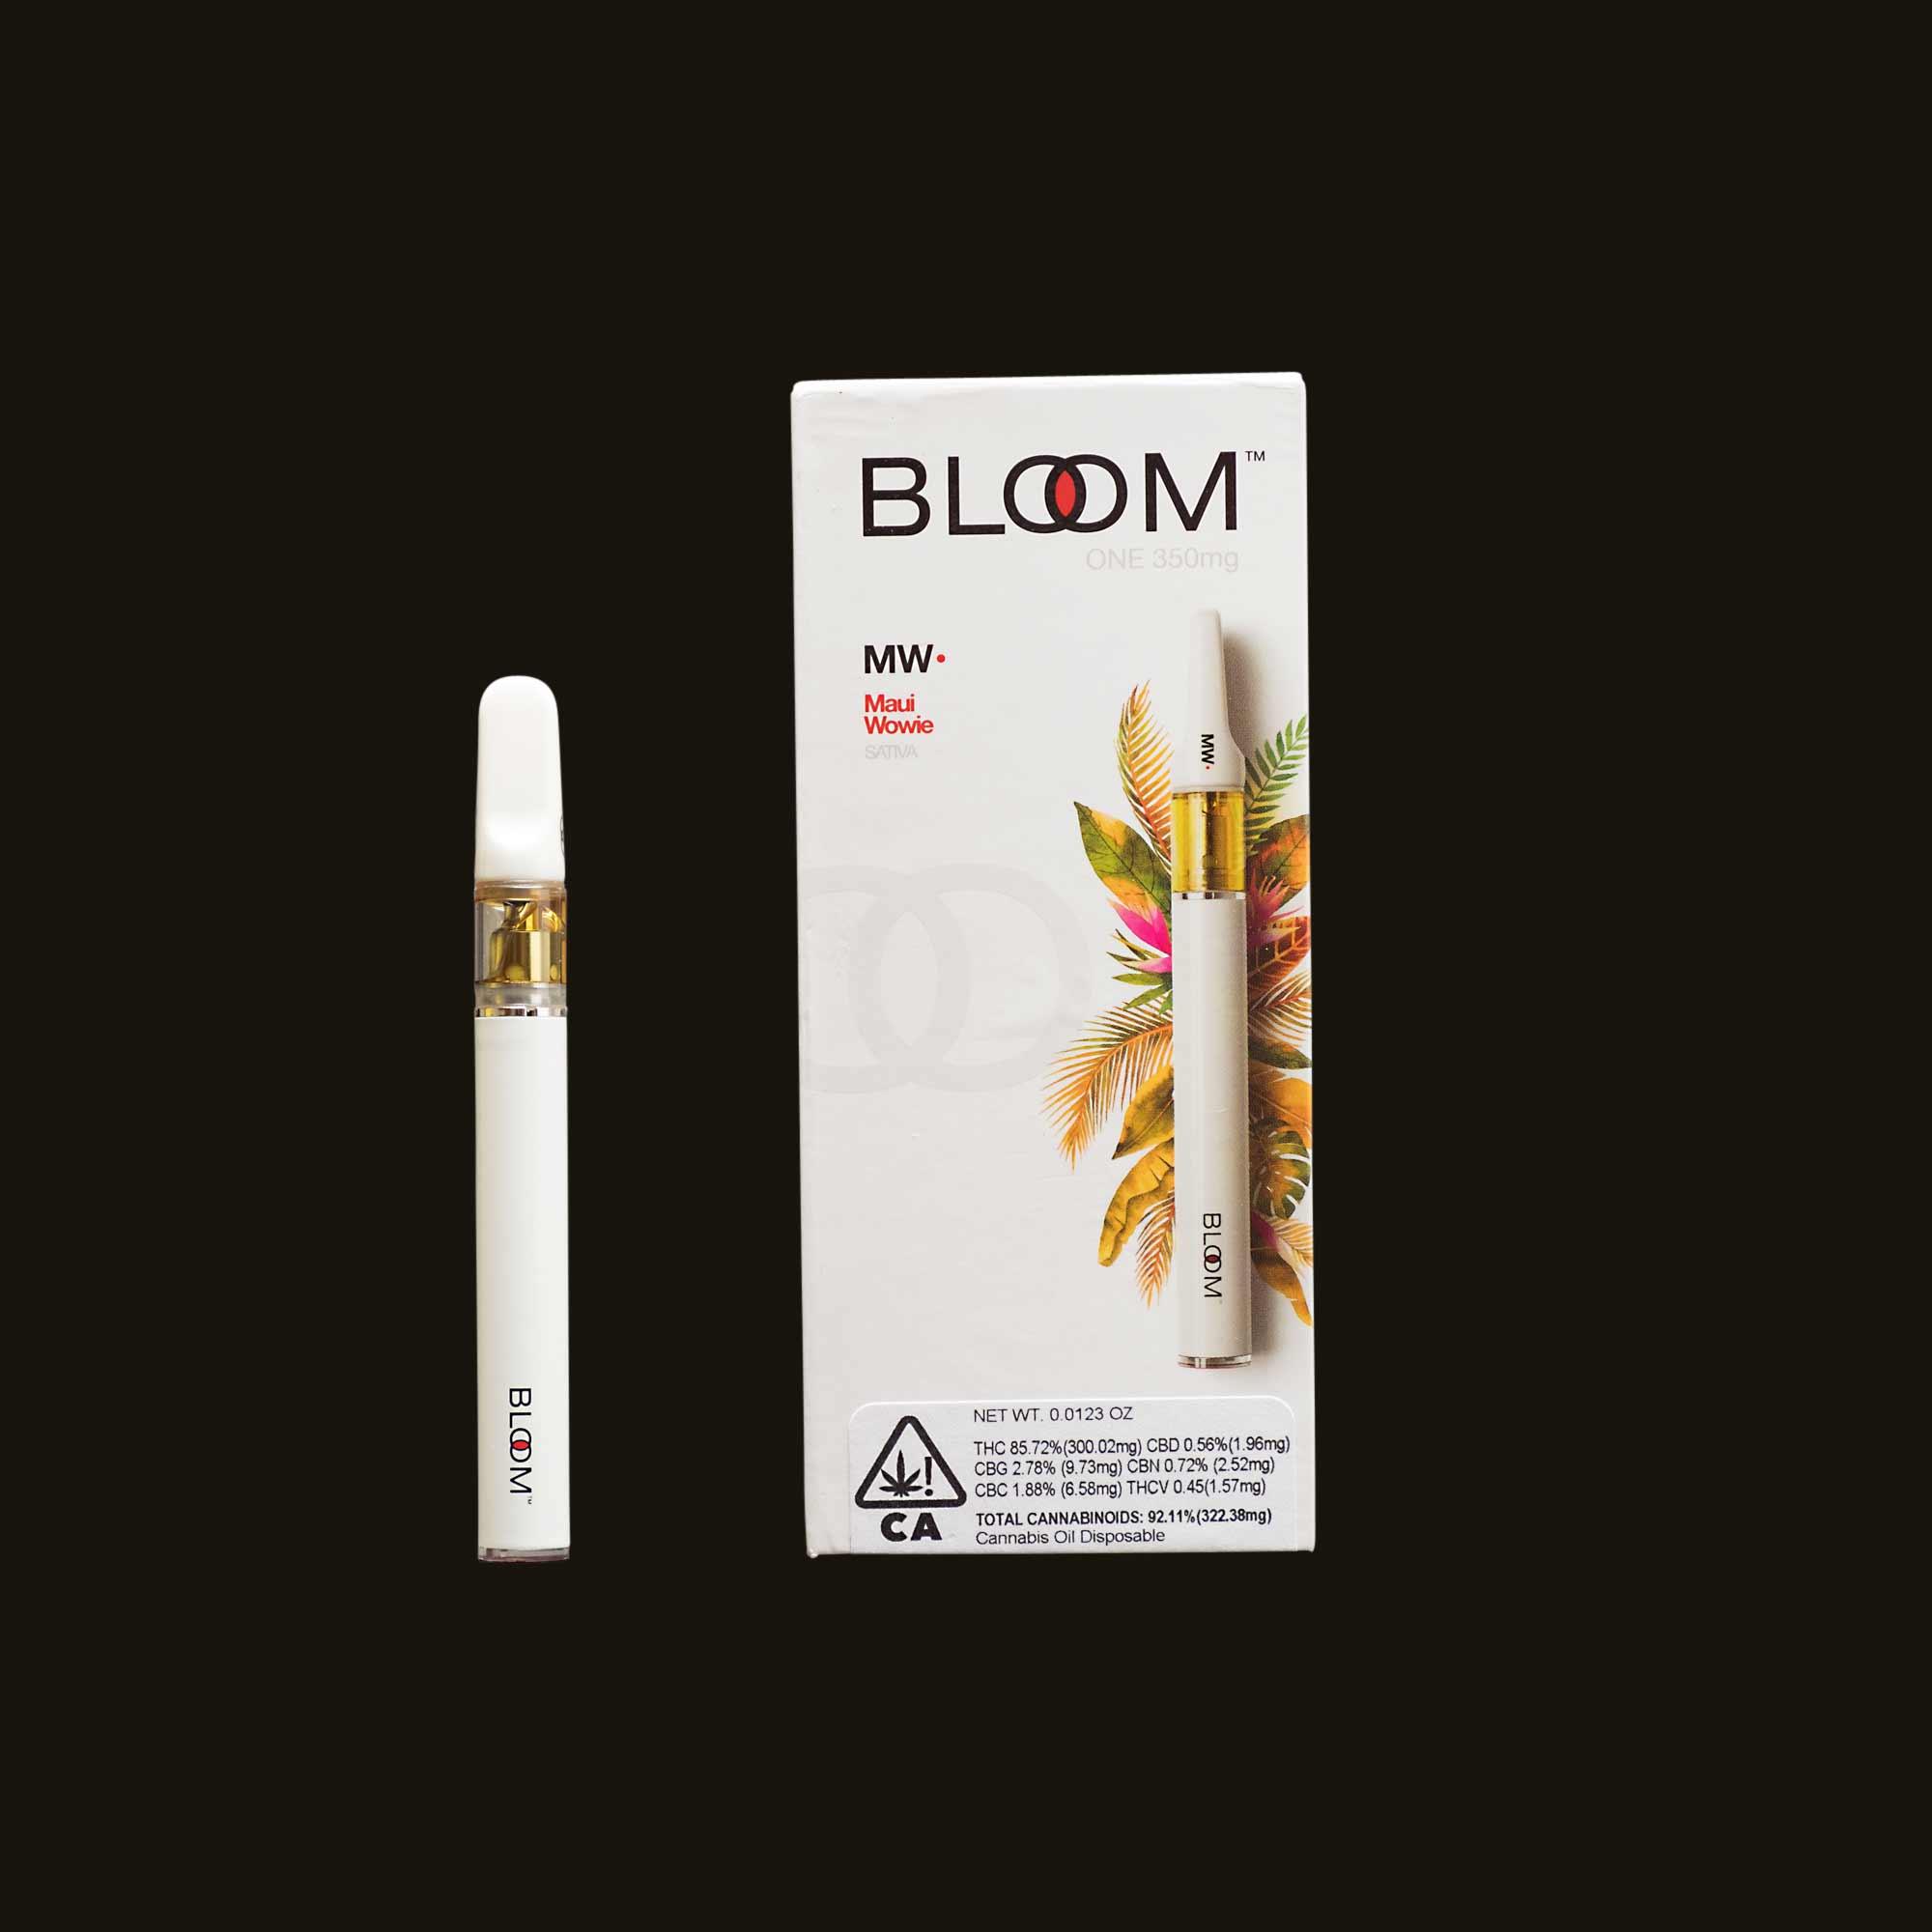 Bloom Brands Maui Wowie Bloom One